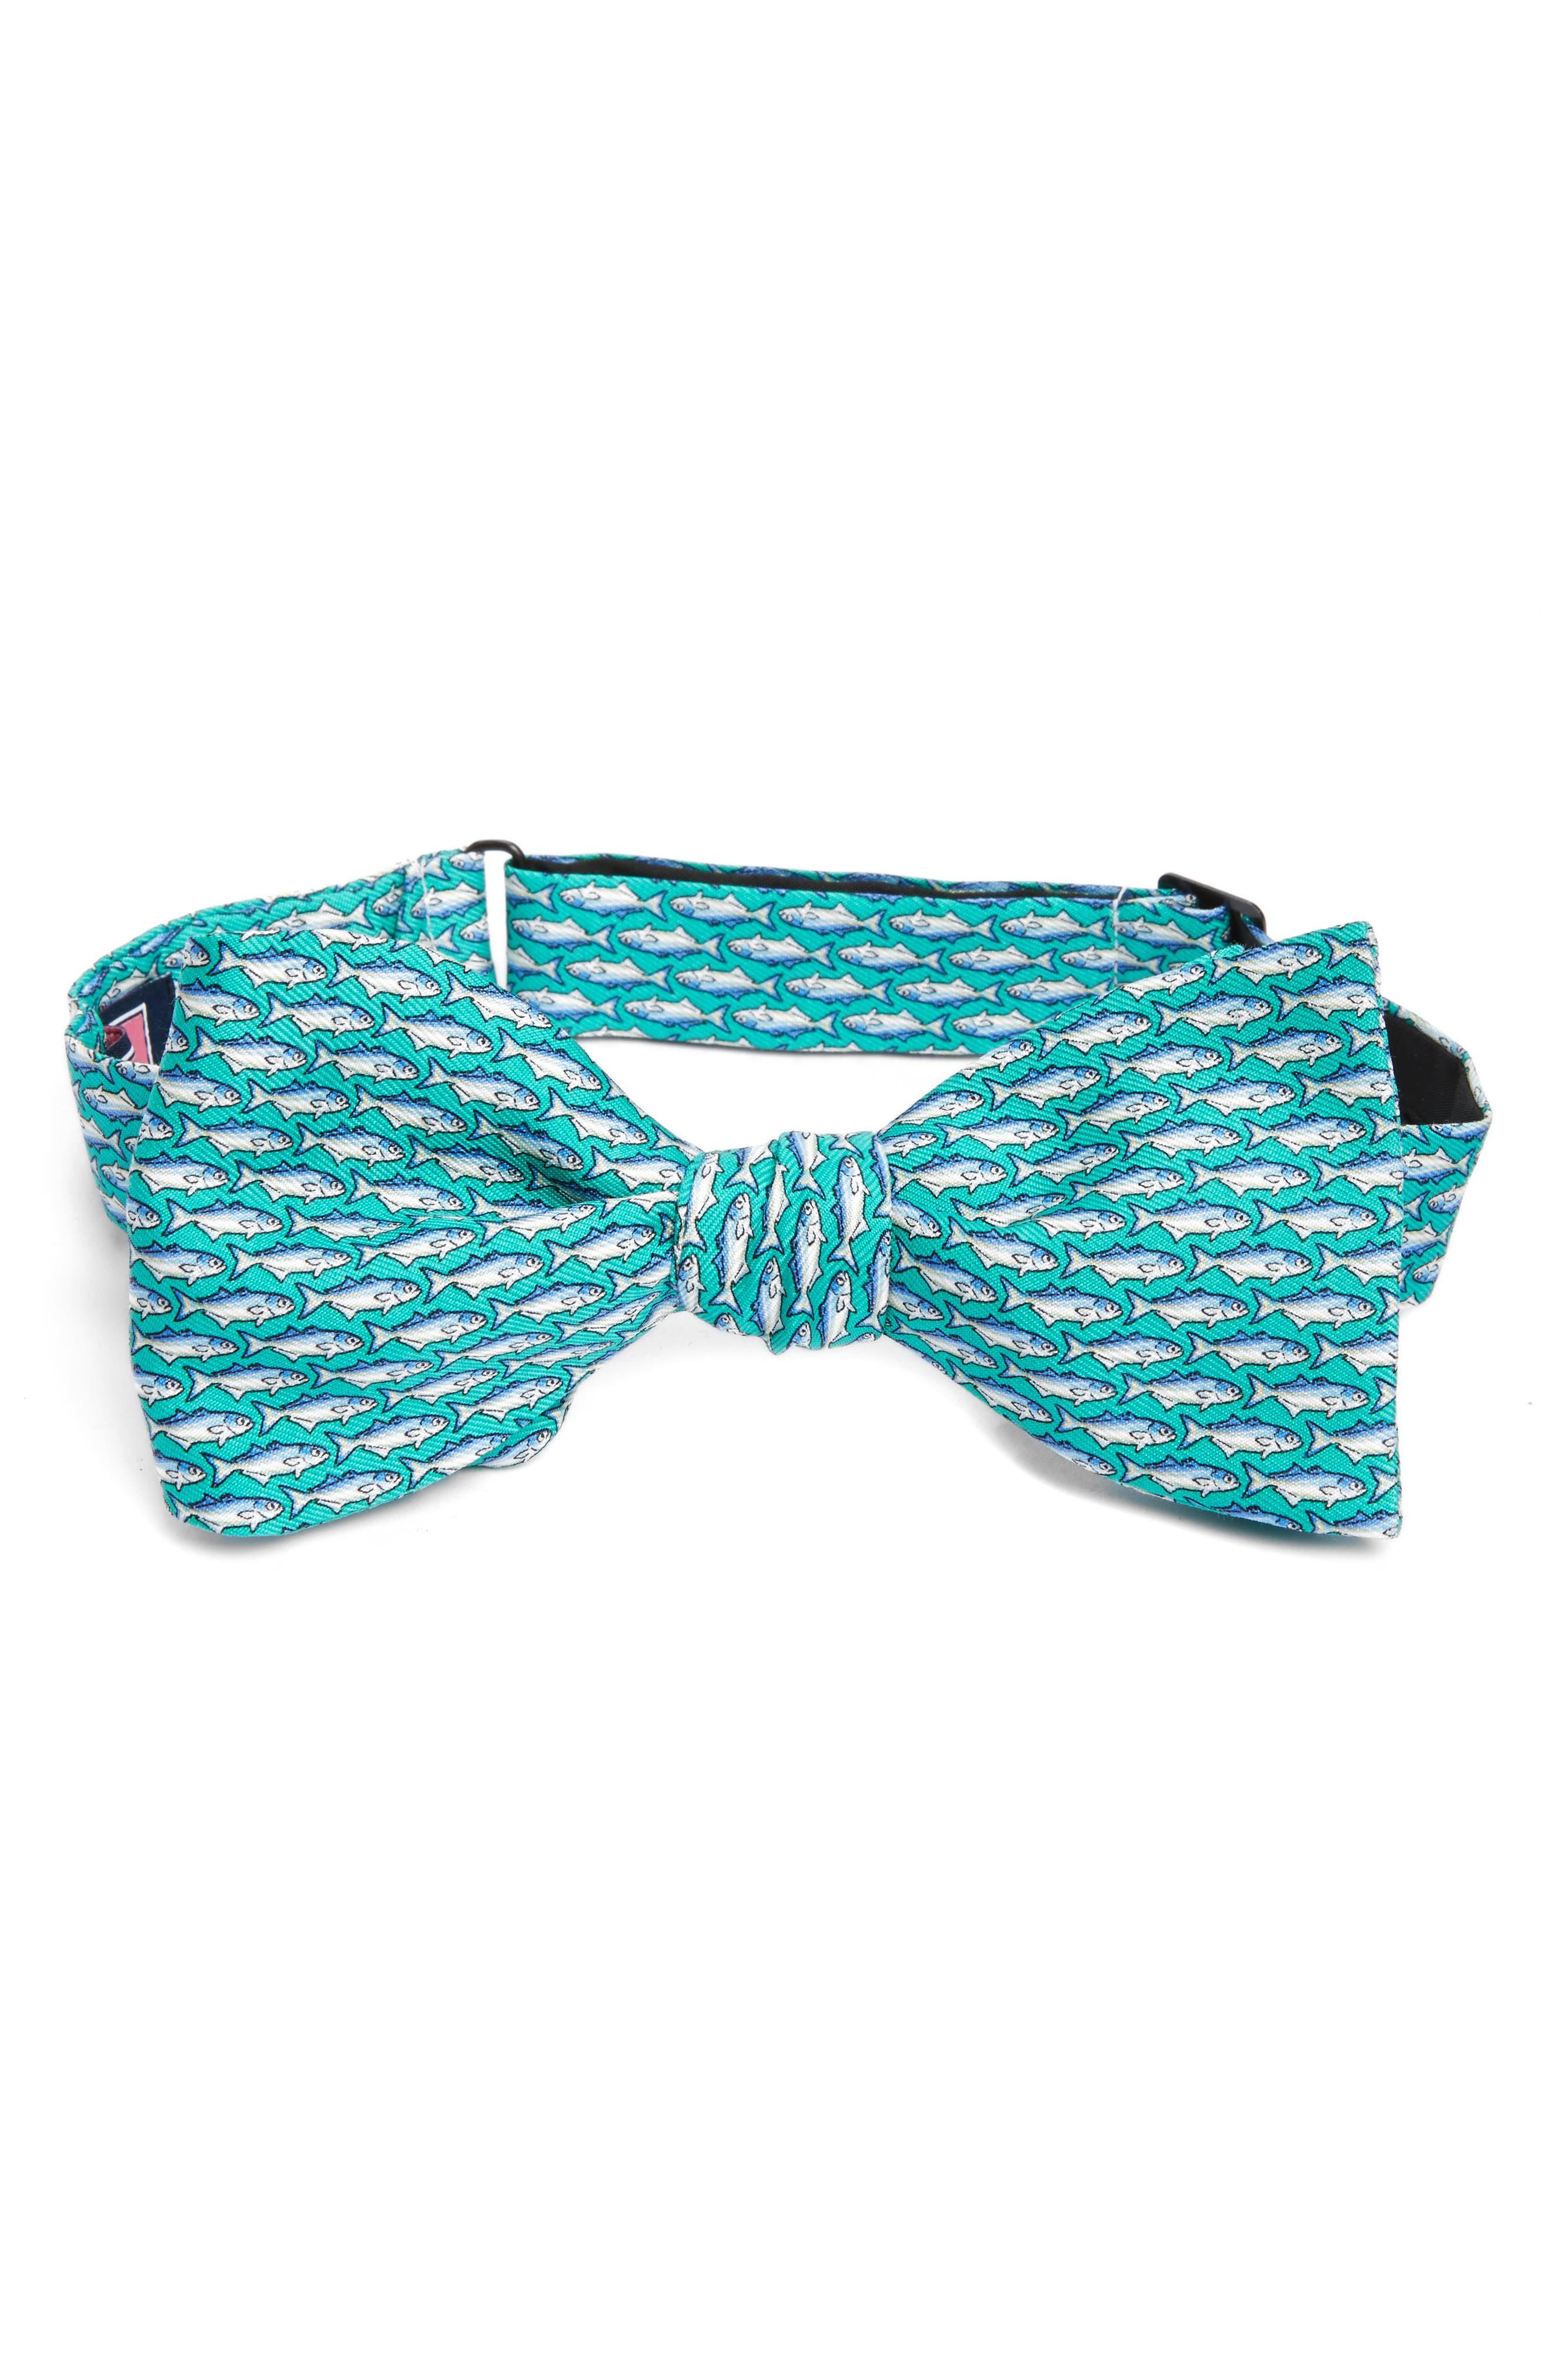 Blue Fish Print Silk Bow Tie,                         Main,                         color, 442